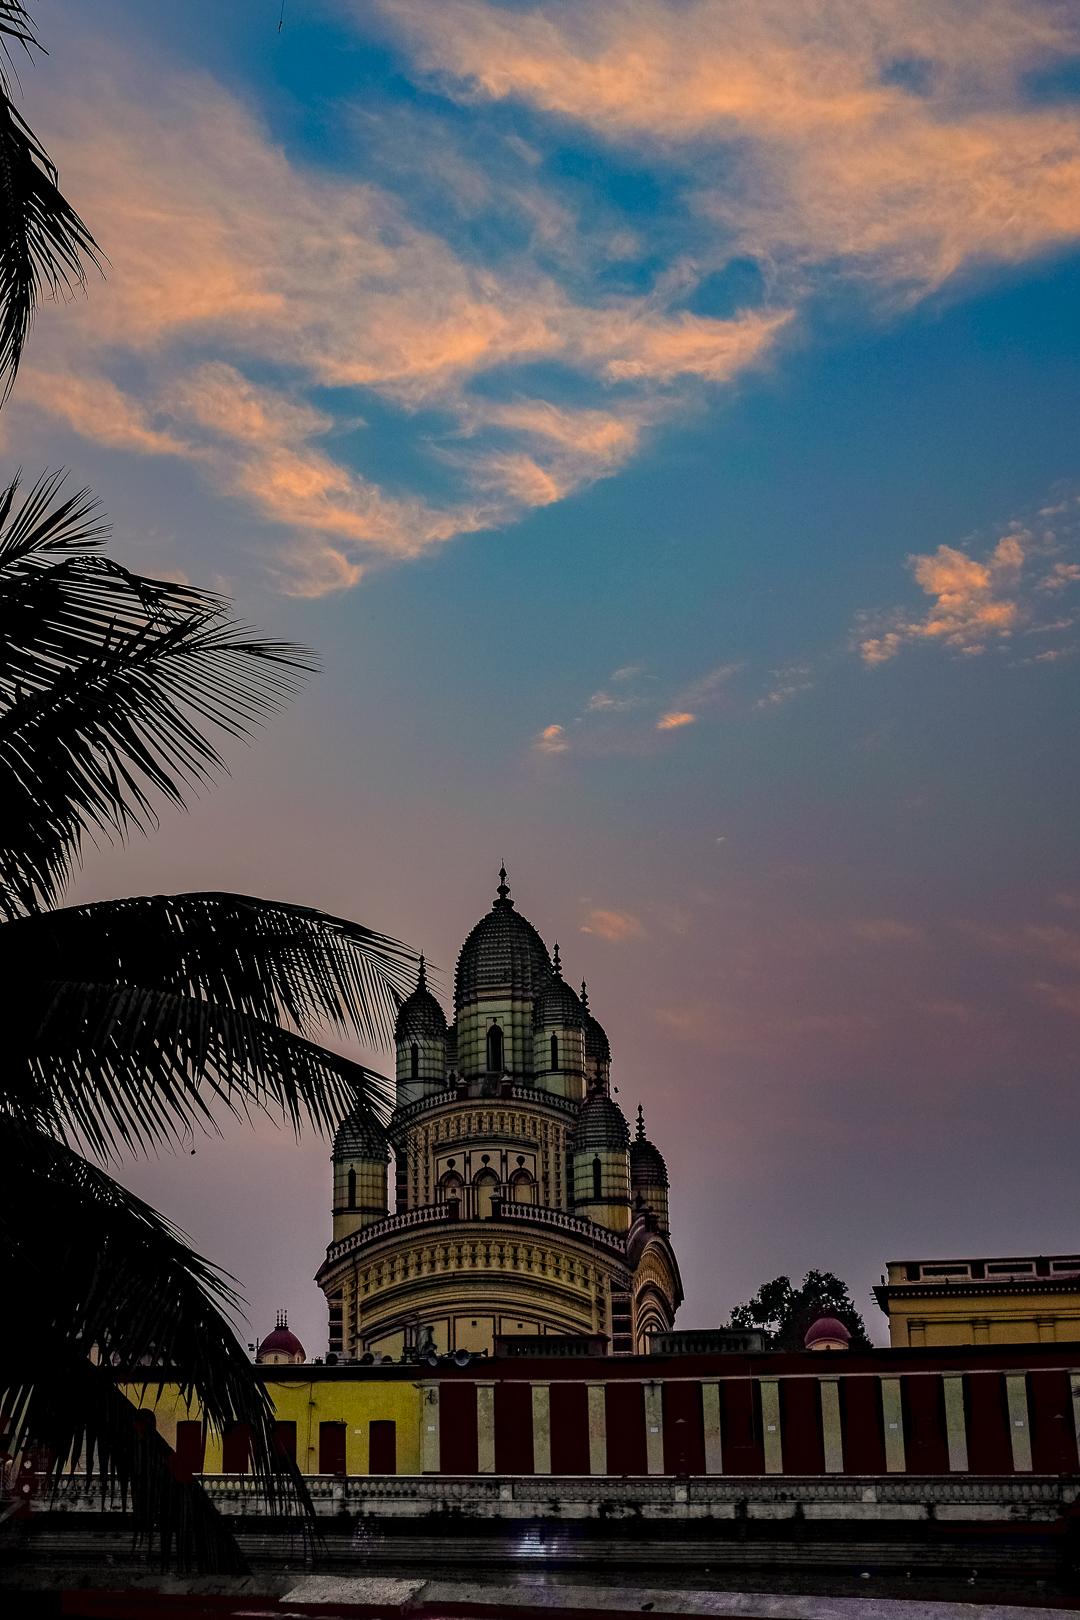 Dakshineshwar, the city most important temple, at sunset.